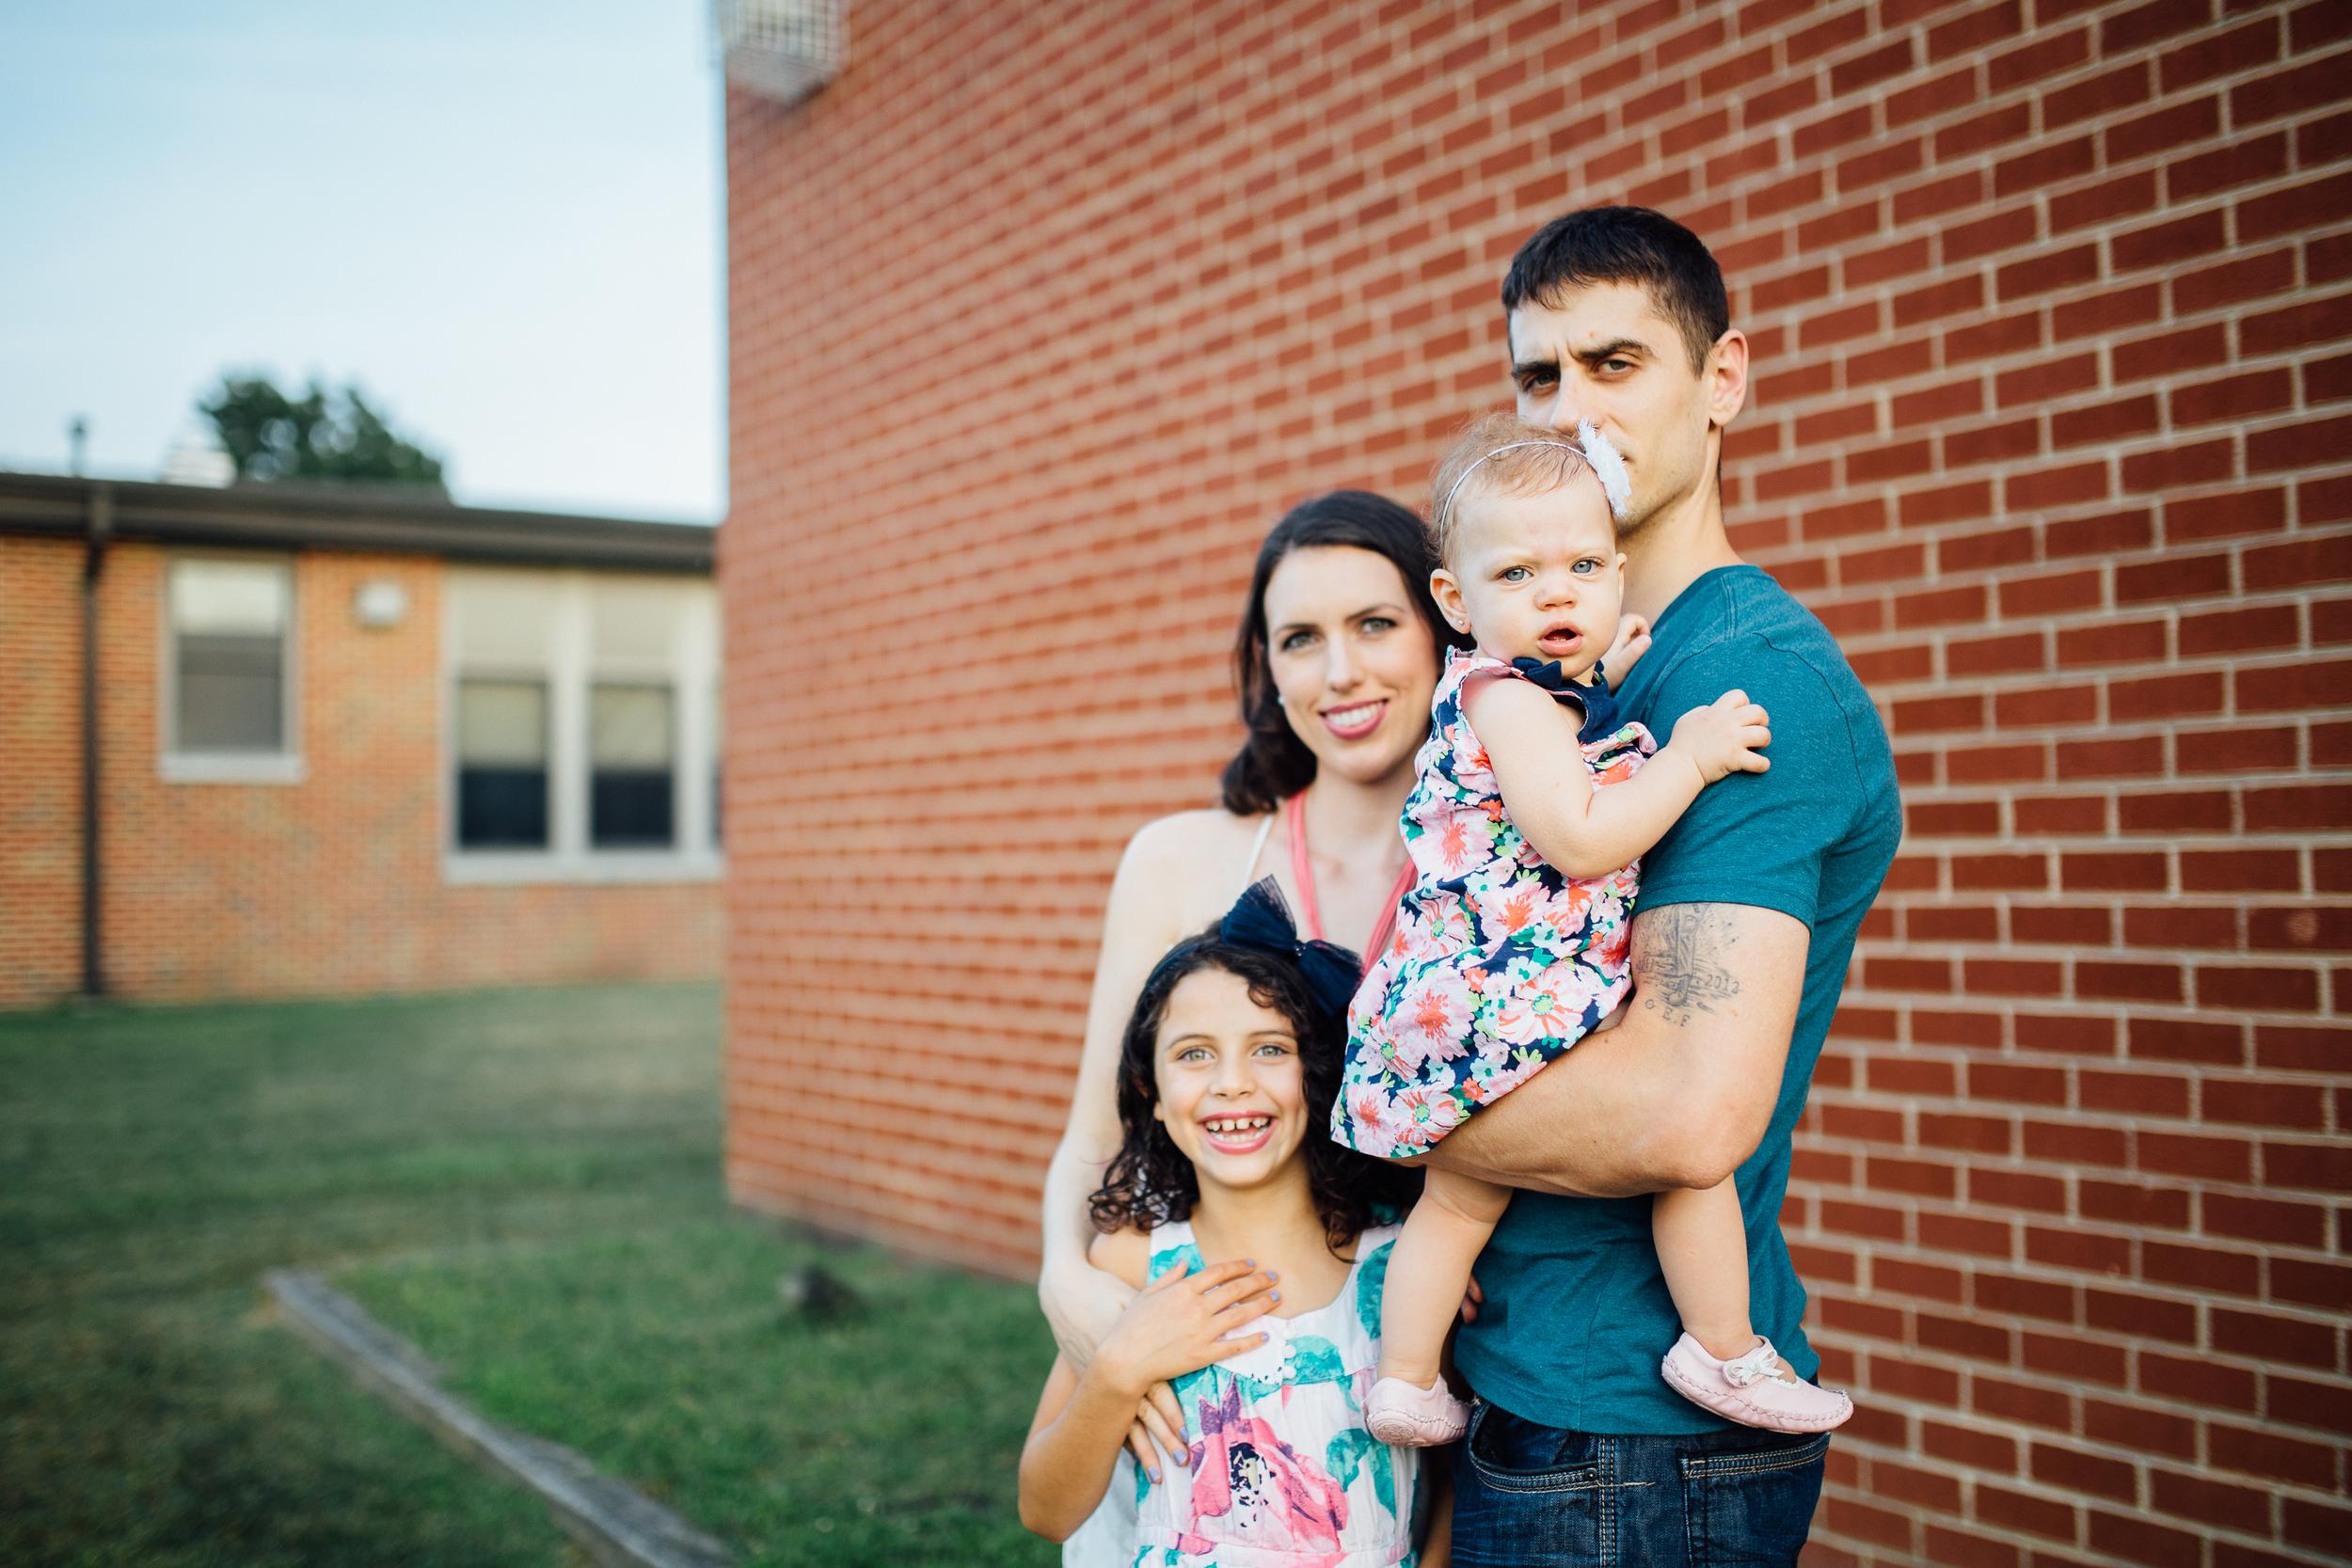 Family_Portrait_Lifestyle_Philadelphia_DAPH_IMG_9721.JPG